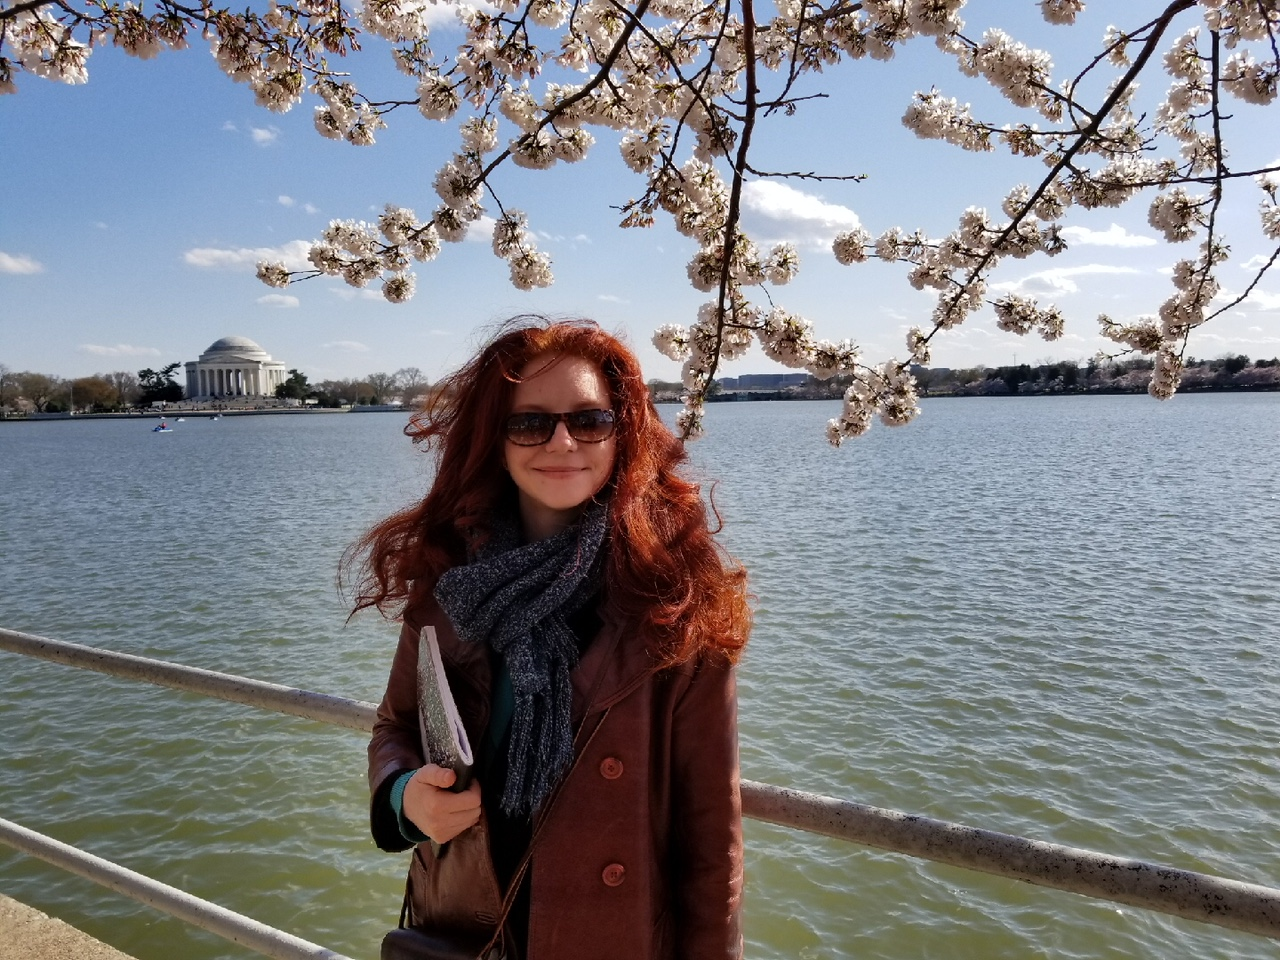 Amanda_Colleen_Williams_Cherry_Blossom_Washington_DC_Songlife